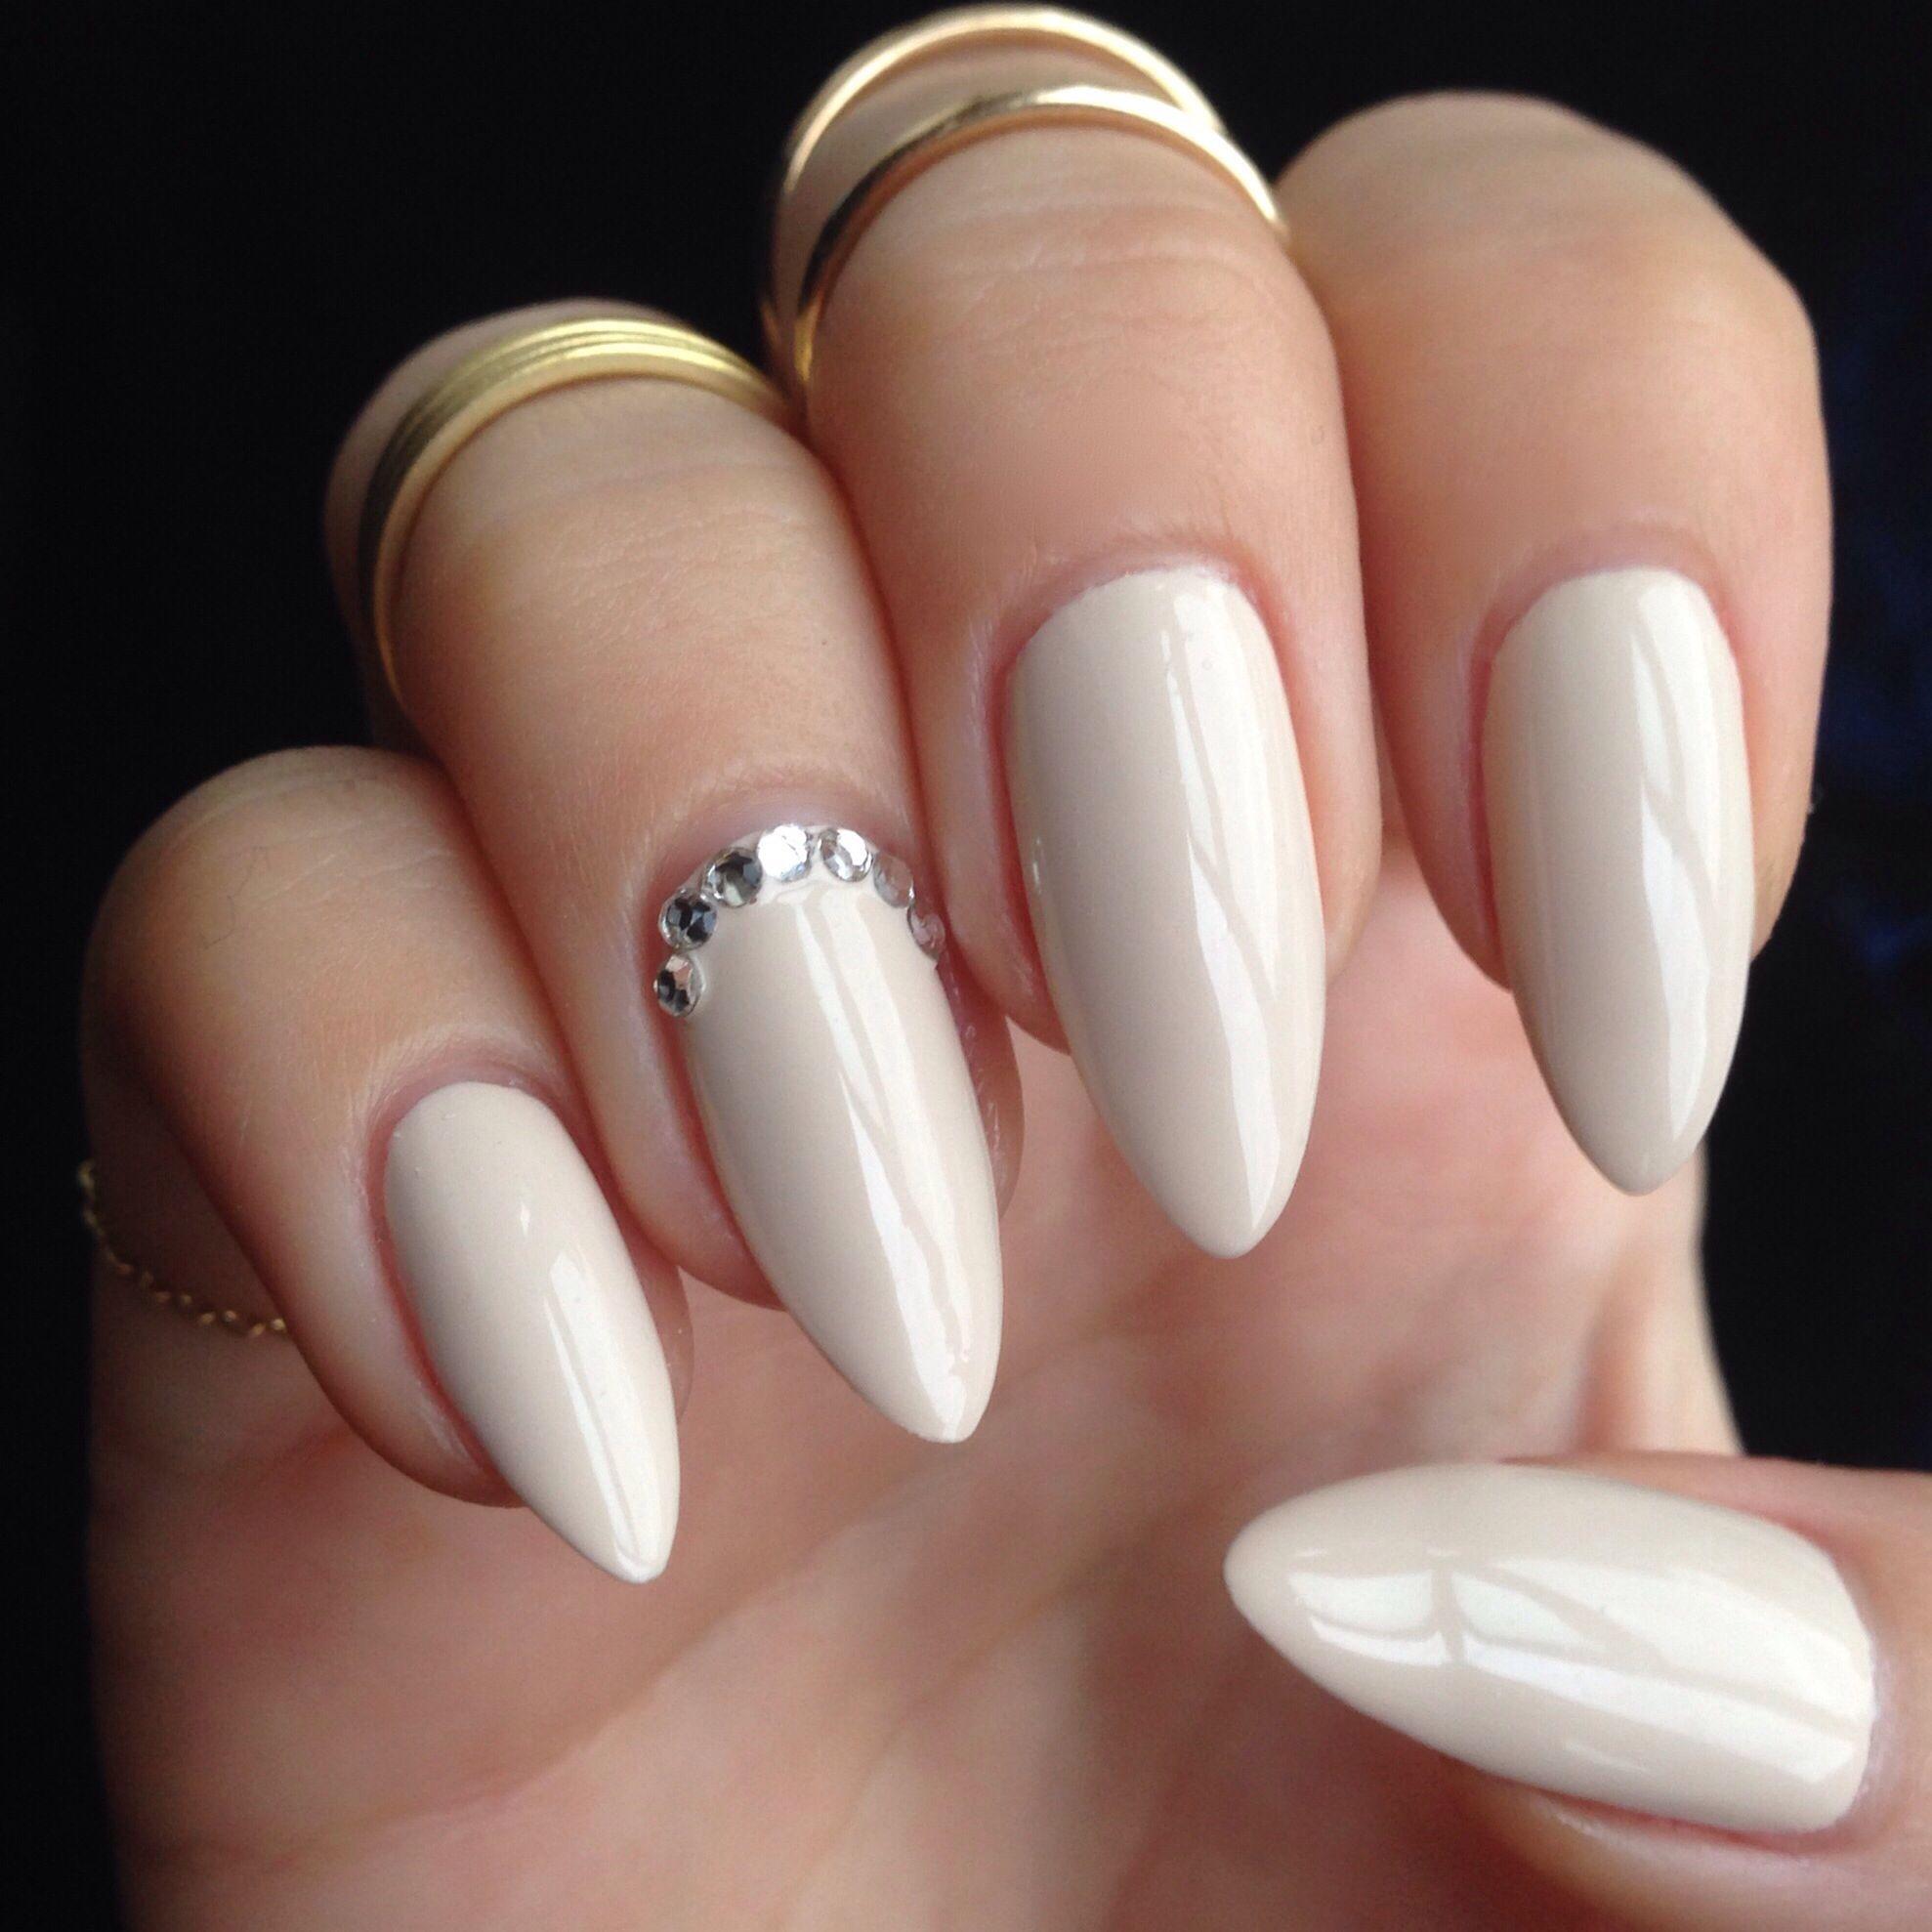 Nail Cream: Cream Embellished Nails